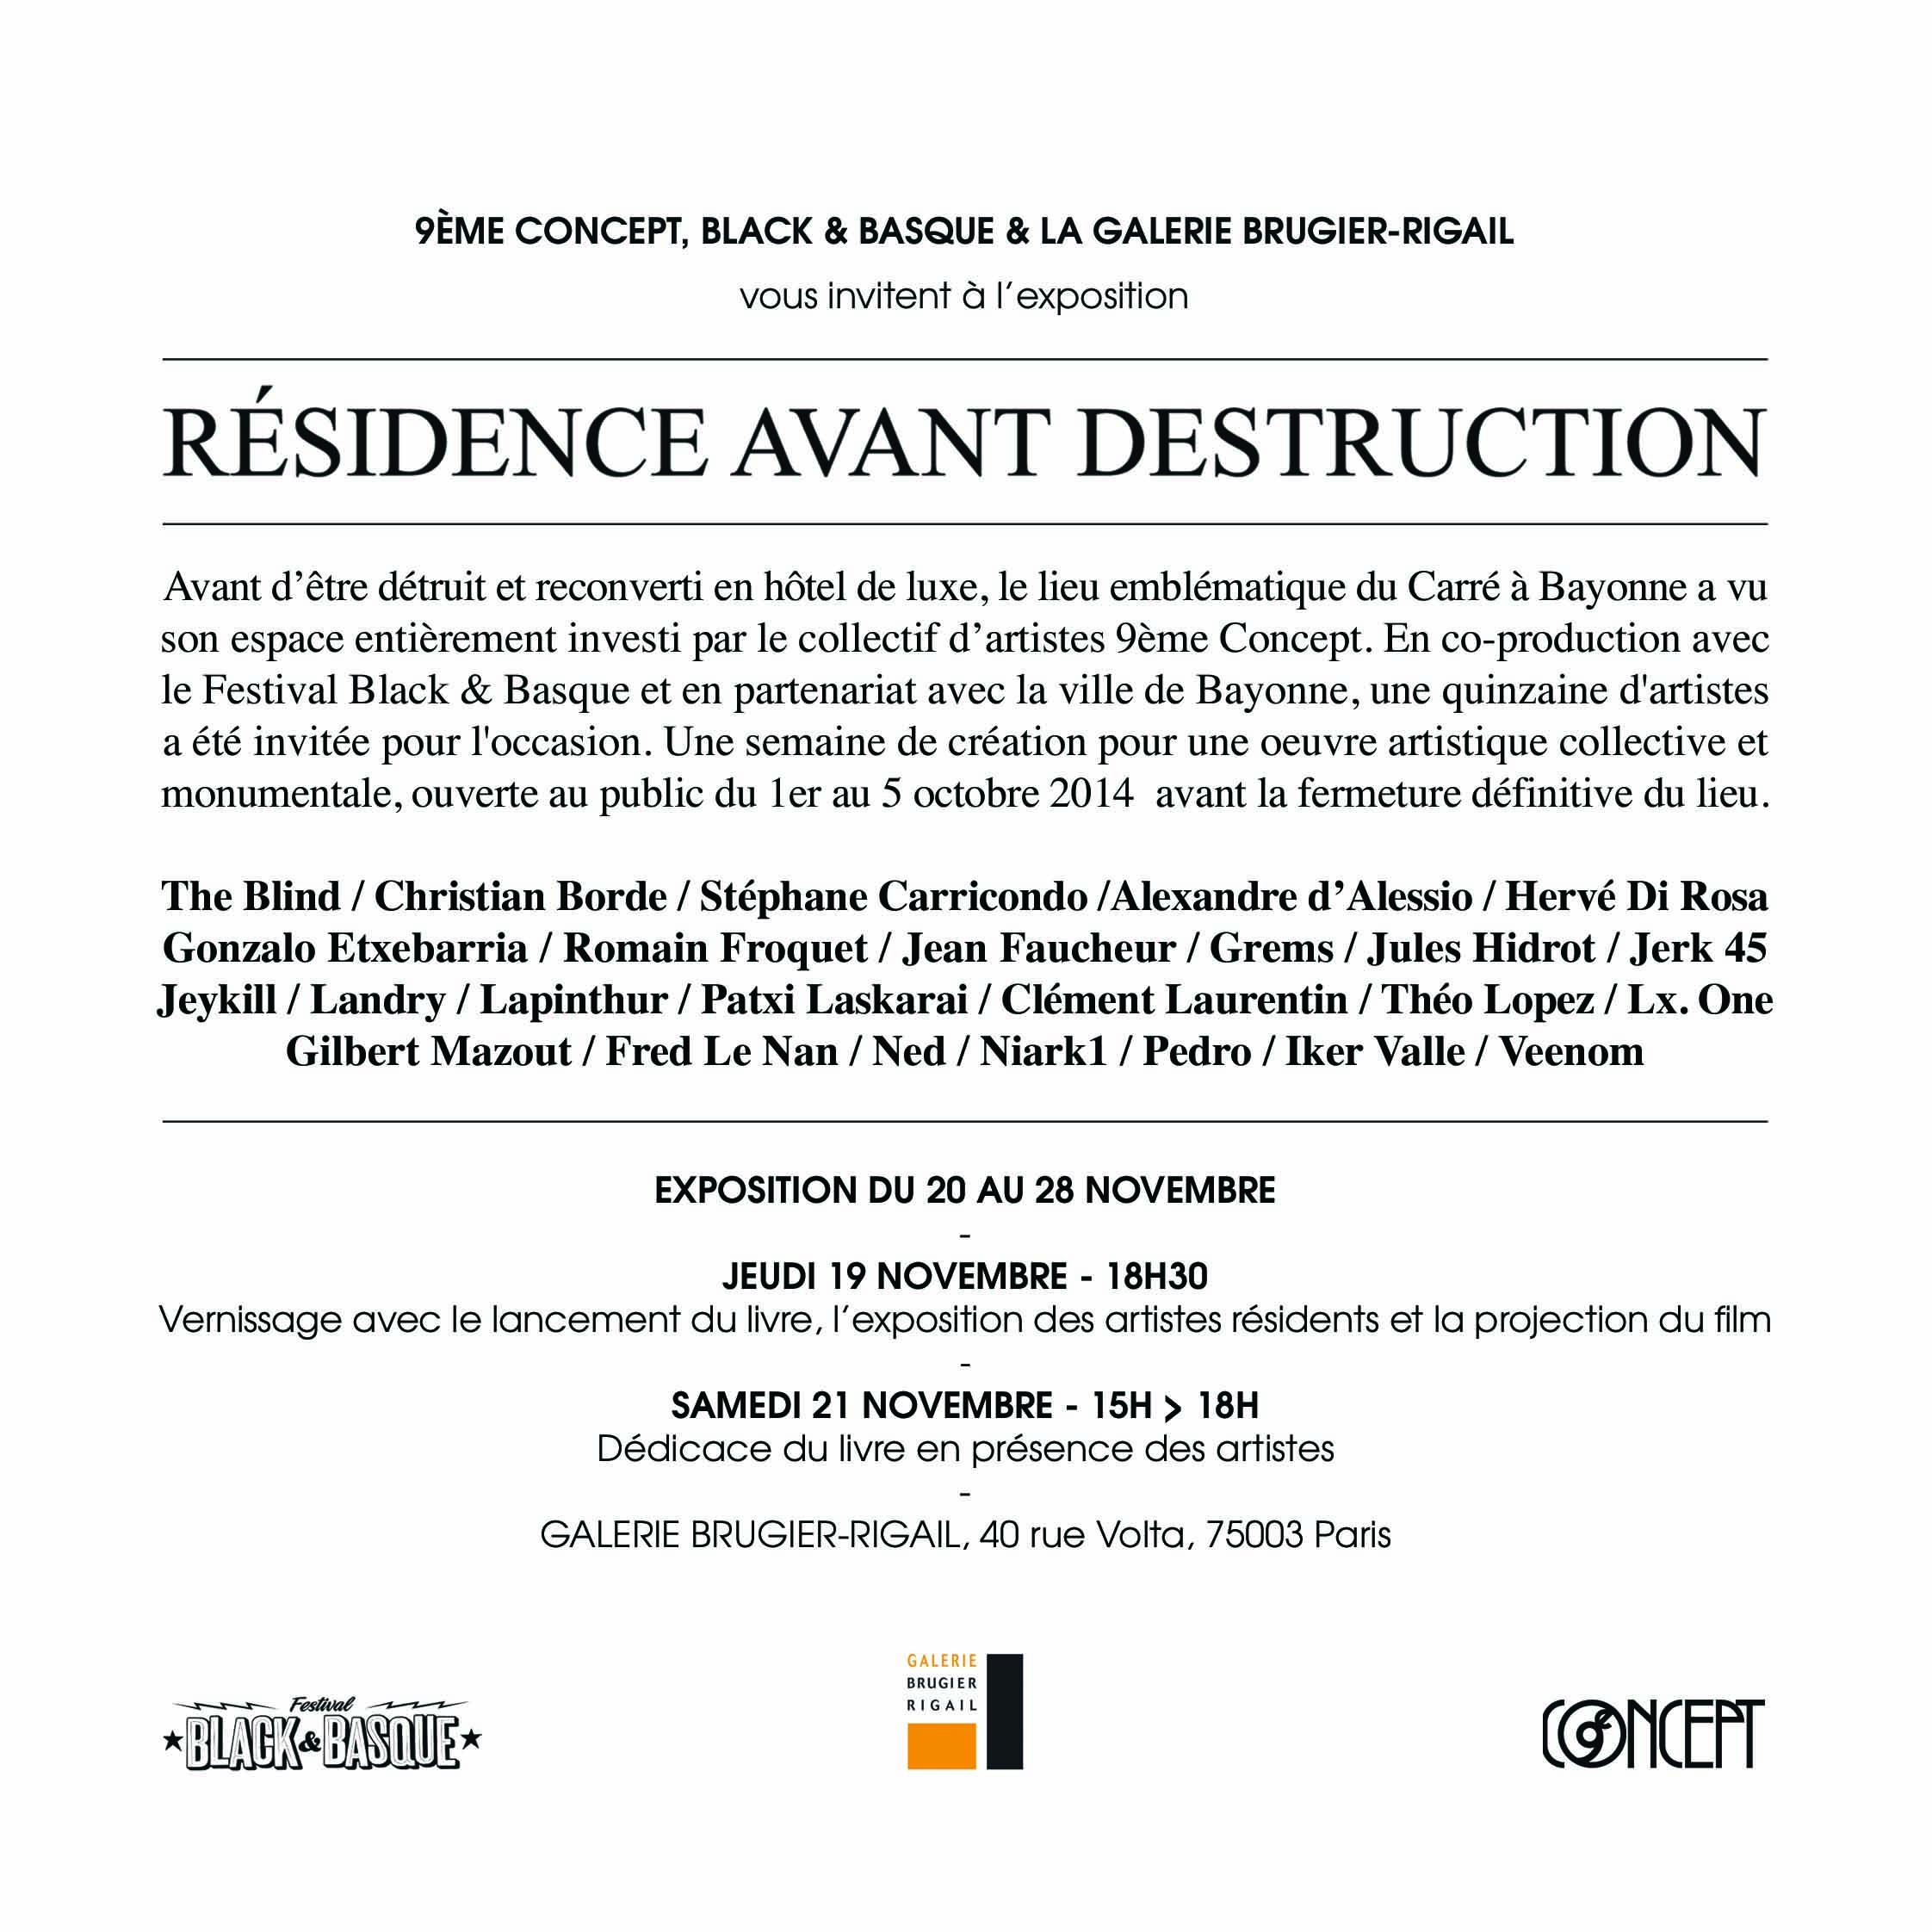 RESIDENCE AVANT DESTRUCTION EXPO GALERIE BRUGIER RIGAIL 2015 LANCEMENT LIVRE